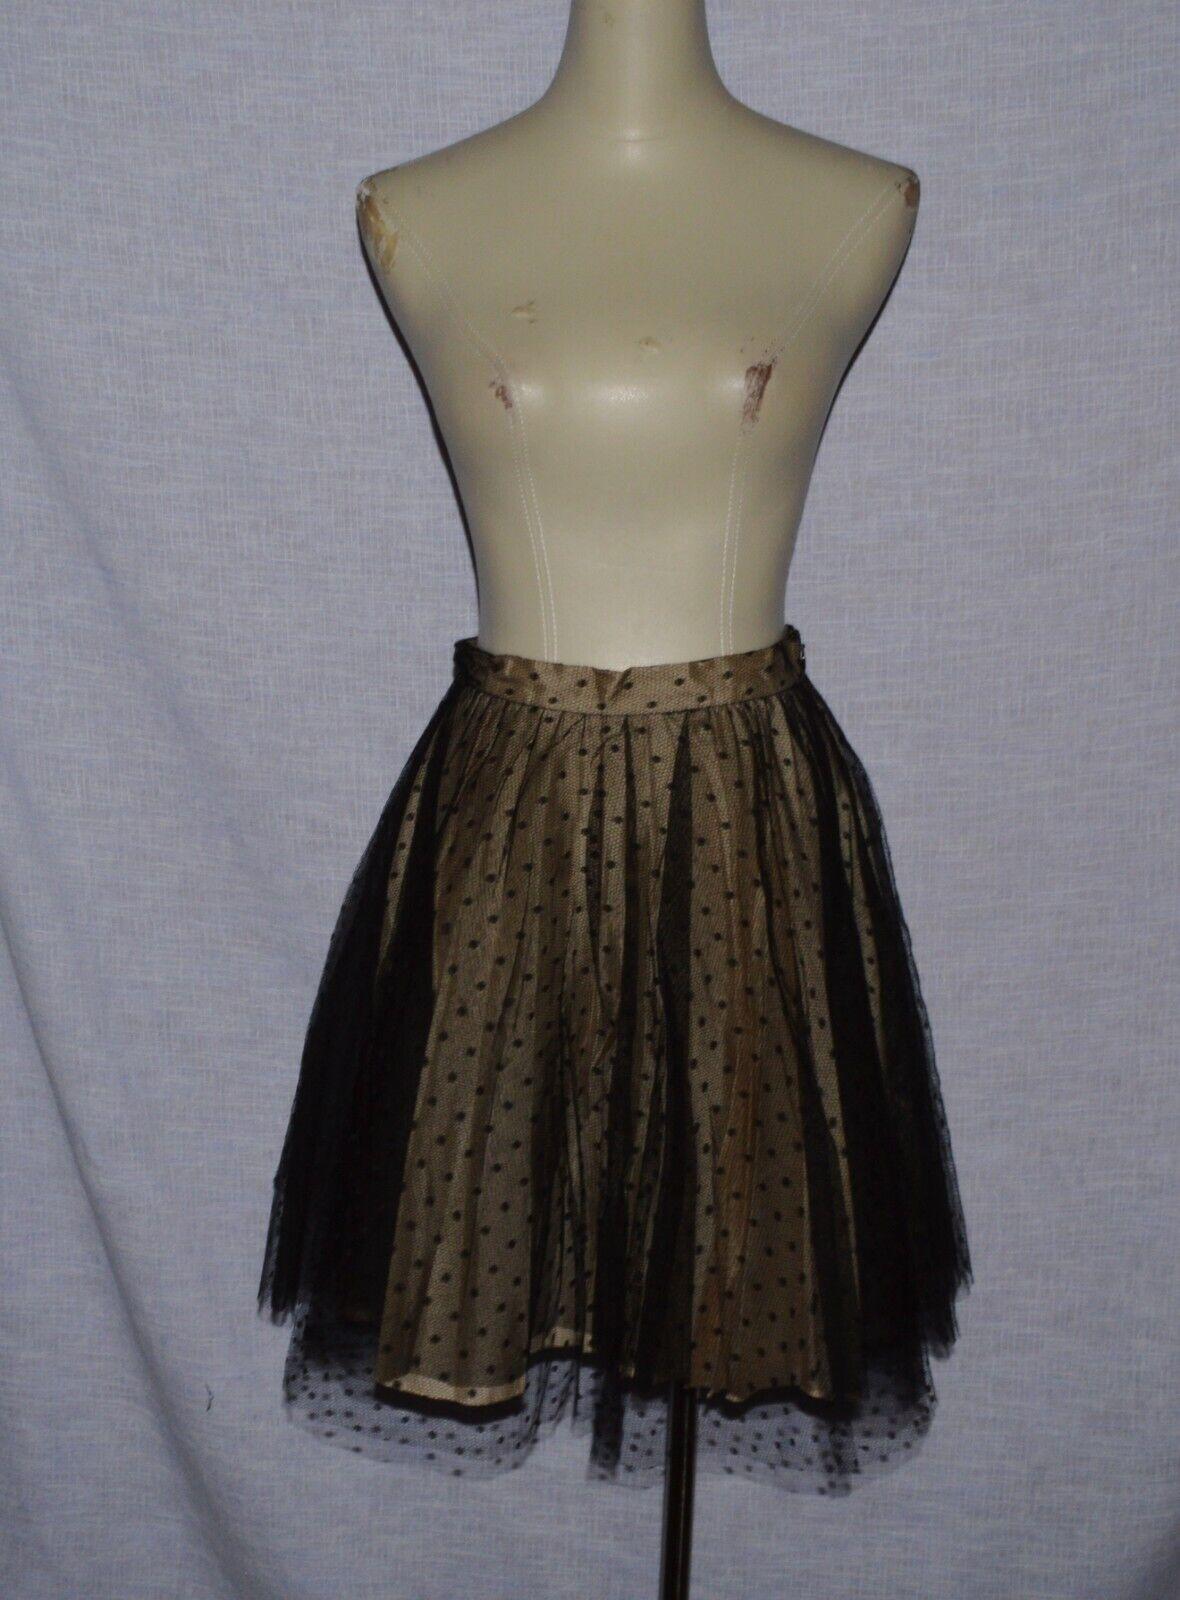 rojo VALENTINO Talla 40 Italia 4 S Pequeño Mini Falda  FLARE Tul Negro Diseñador  venta al por mayor barato